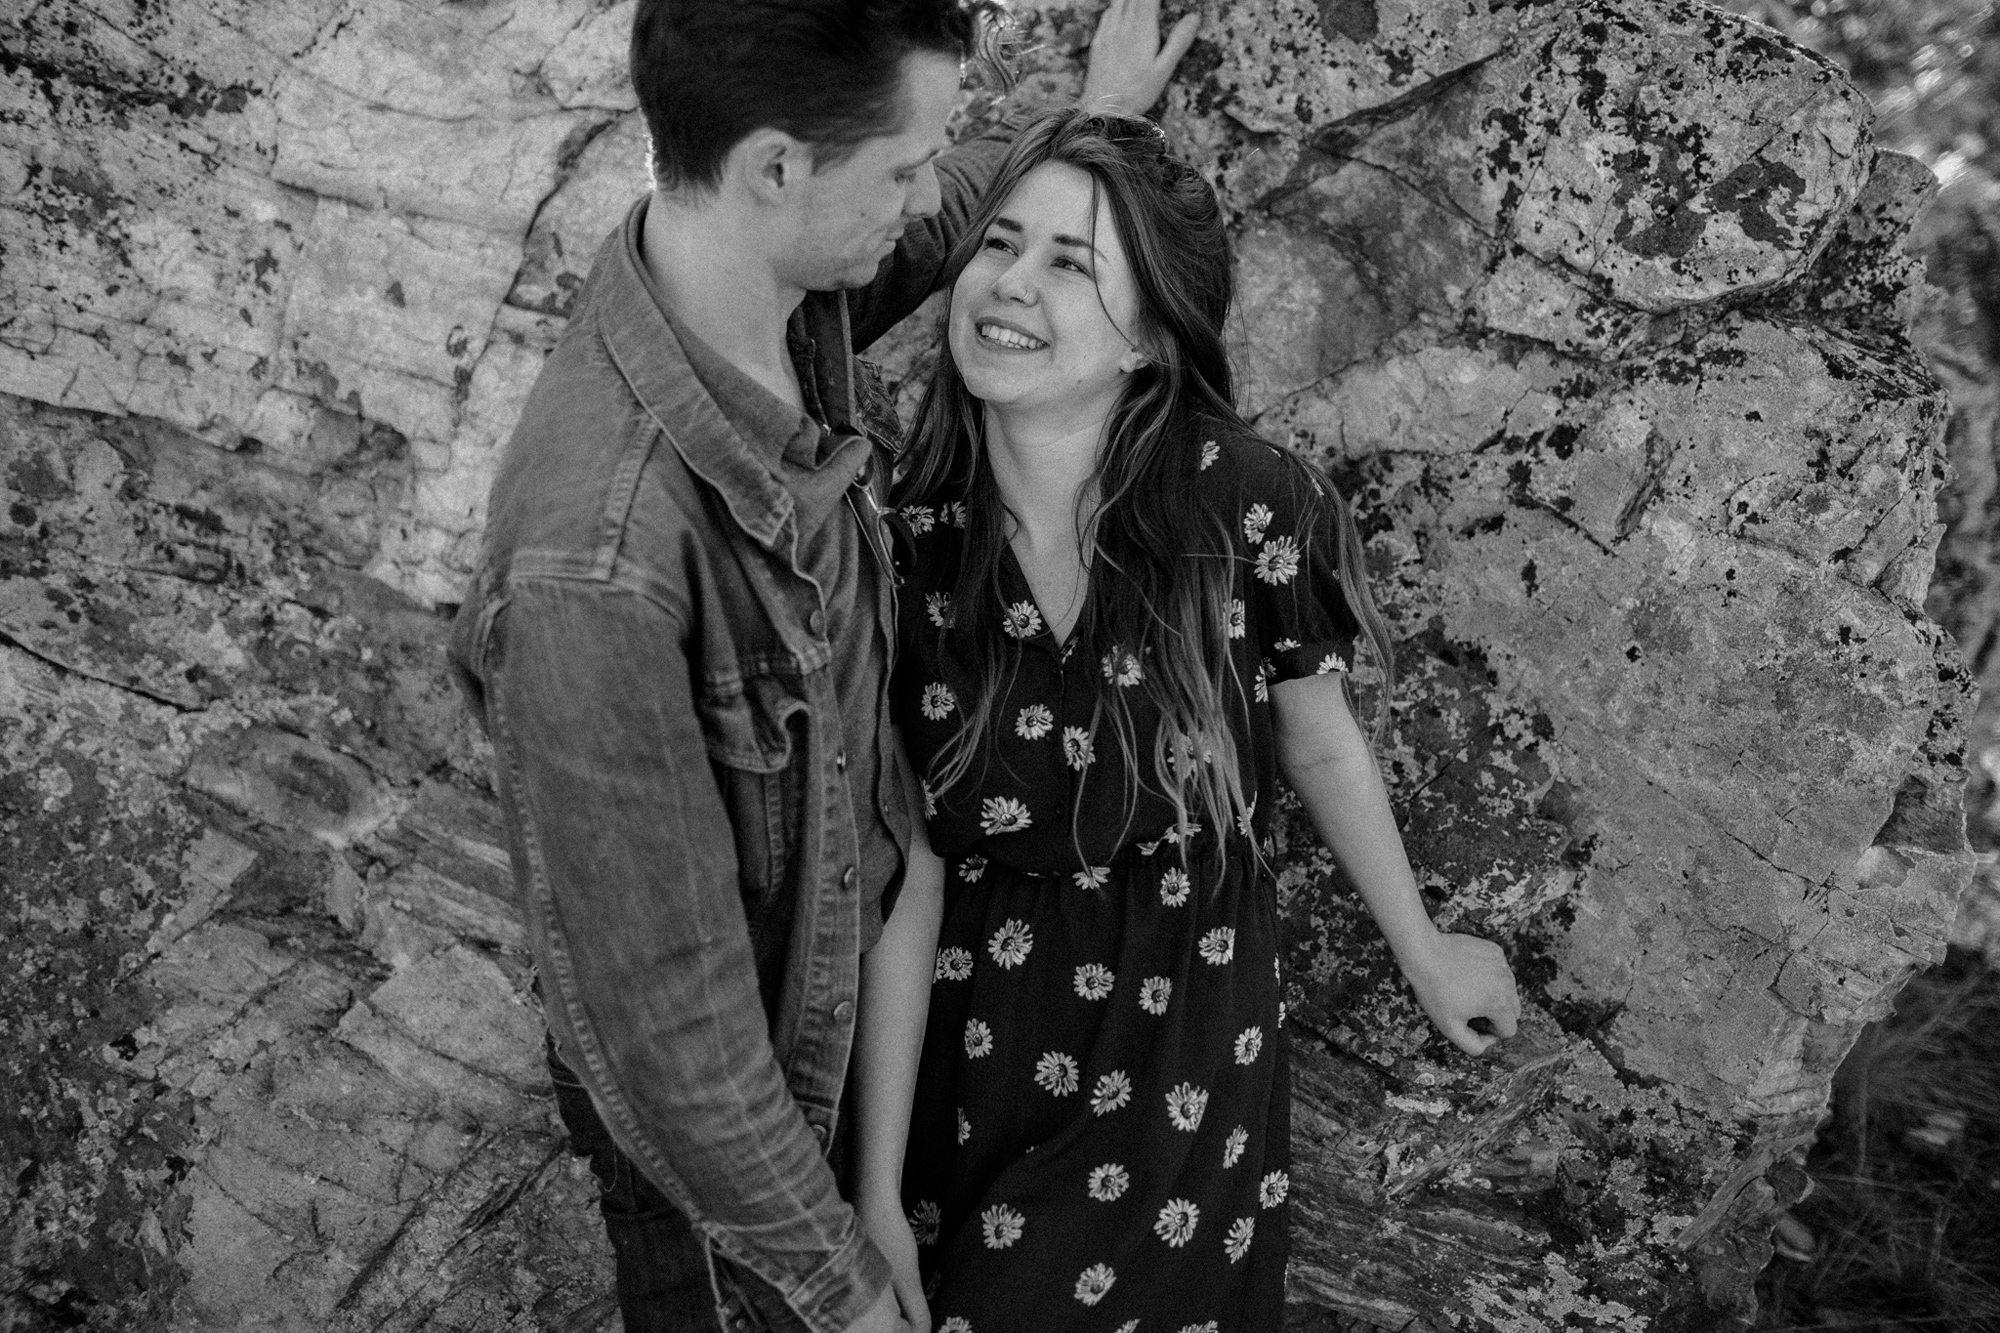 Ephriam + Sylvanna  //  Kelowna Engagement Photographer, Luke Liable  // Victoria & Vancouver Island Wedding Photographer